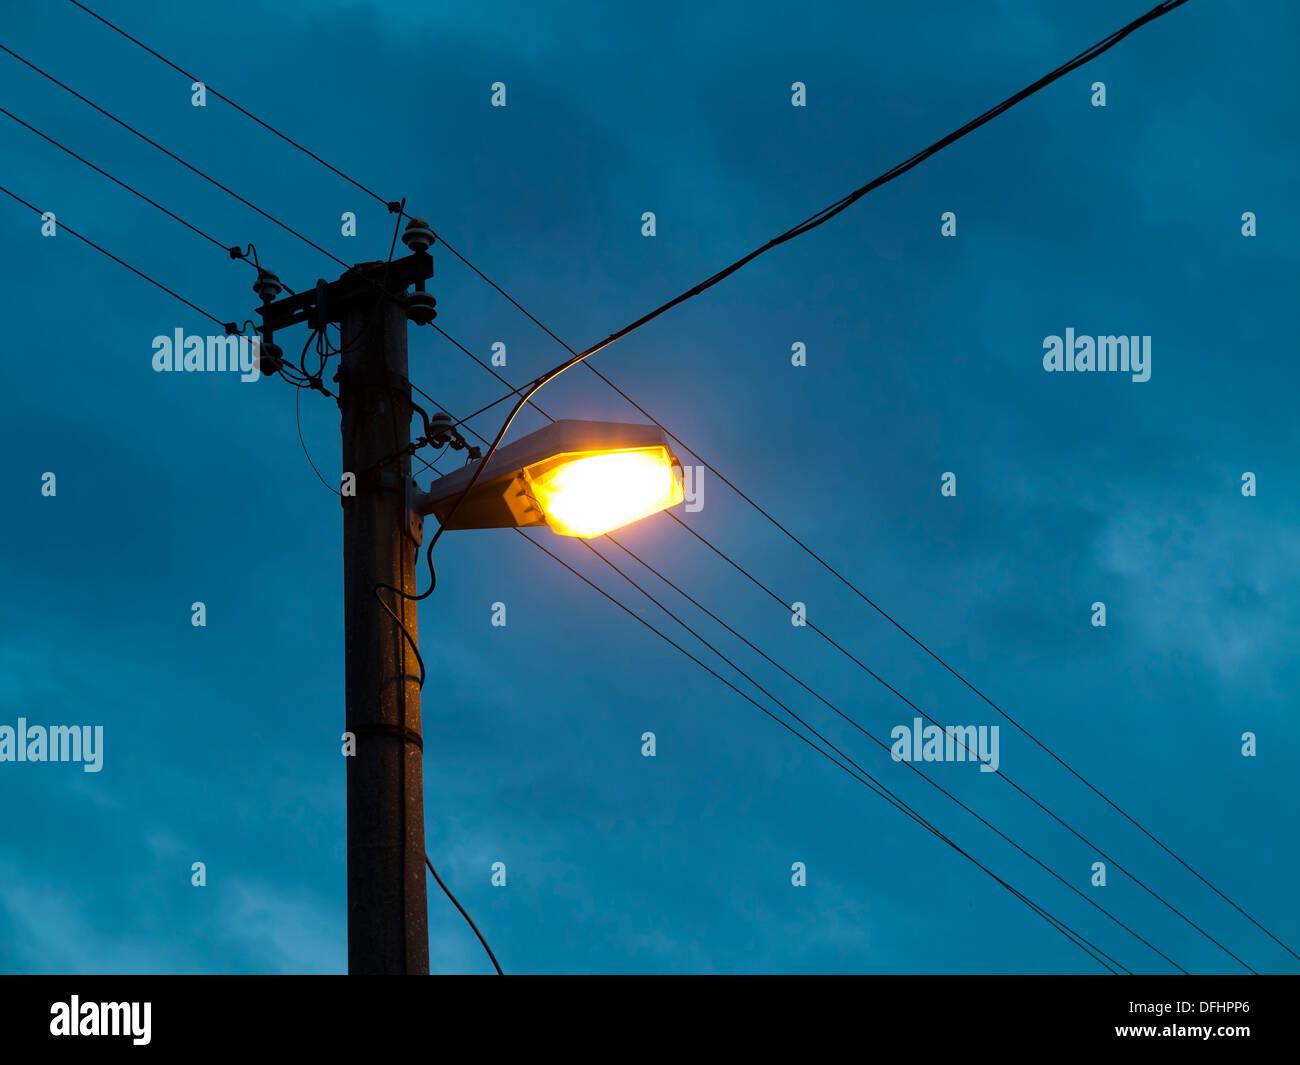 Tremendous Wiring Wire Street Light Stock Photos Wiring Wire Street Light Wiring Cloud Funidienstapotheekhoekschewaardnl